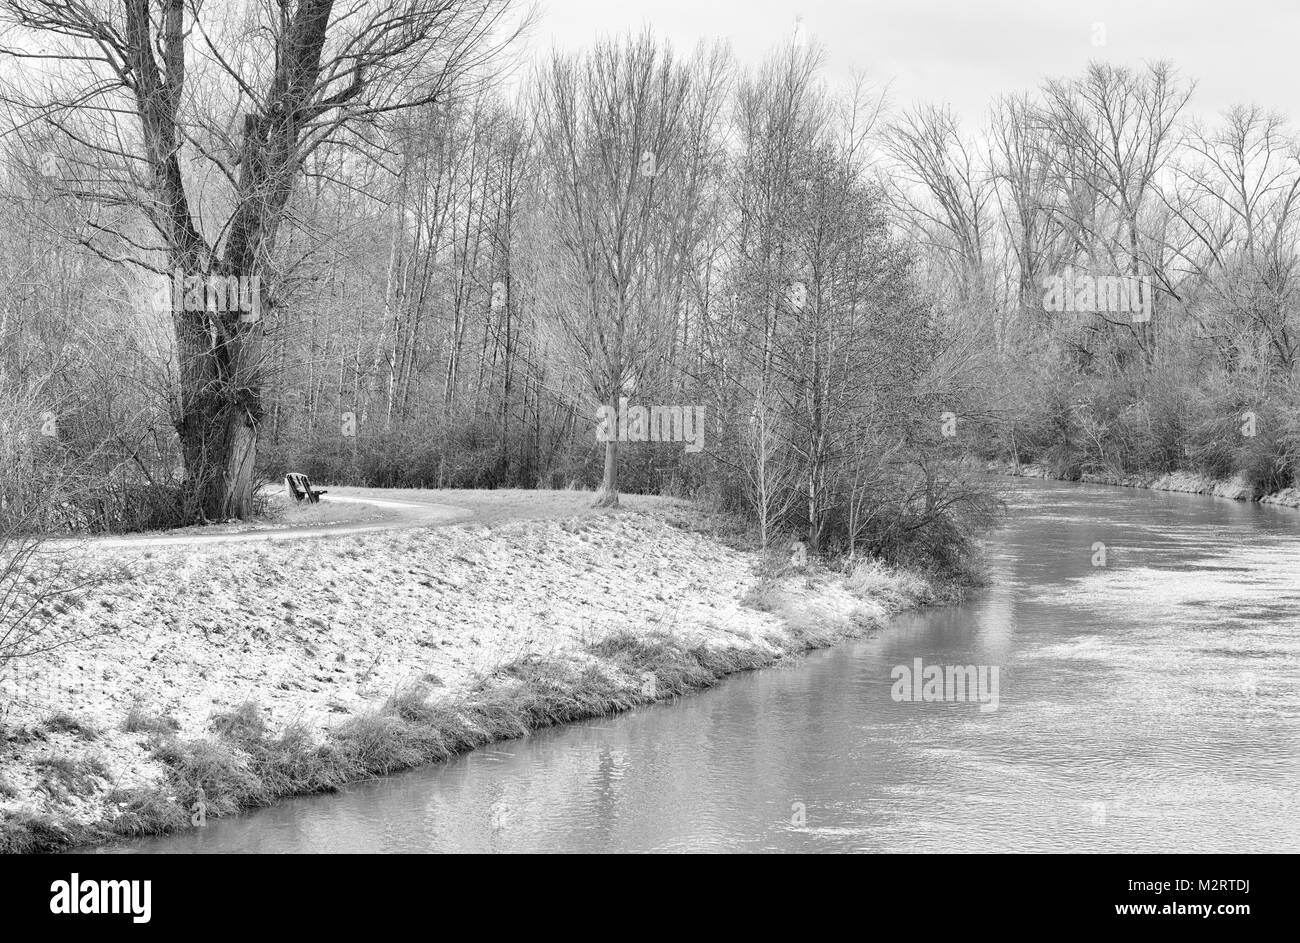 Monochrome nature landscape image of a rural autumnal / fall / winter countryside idyllic river morning scene,promenade, - Stock Image